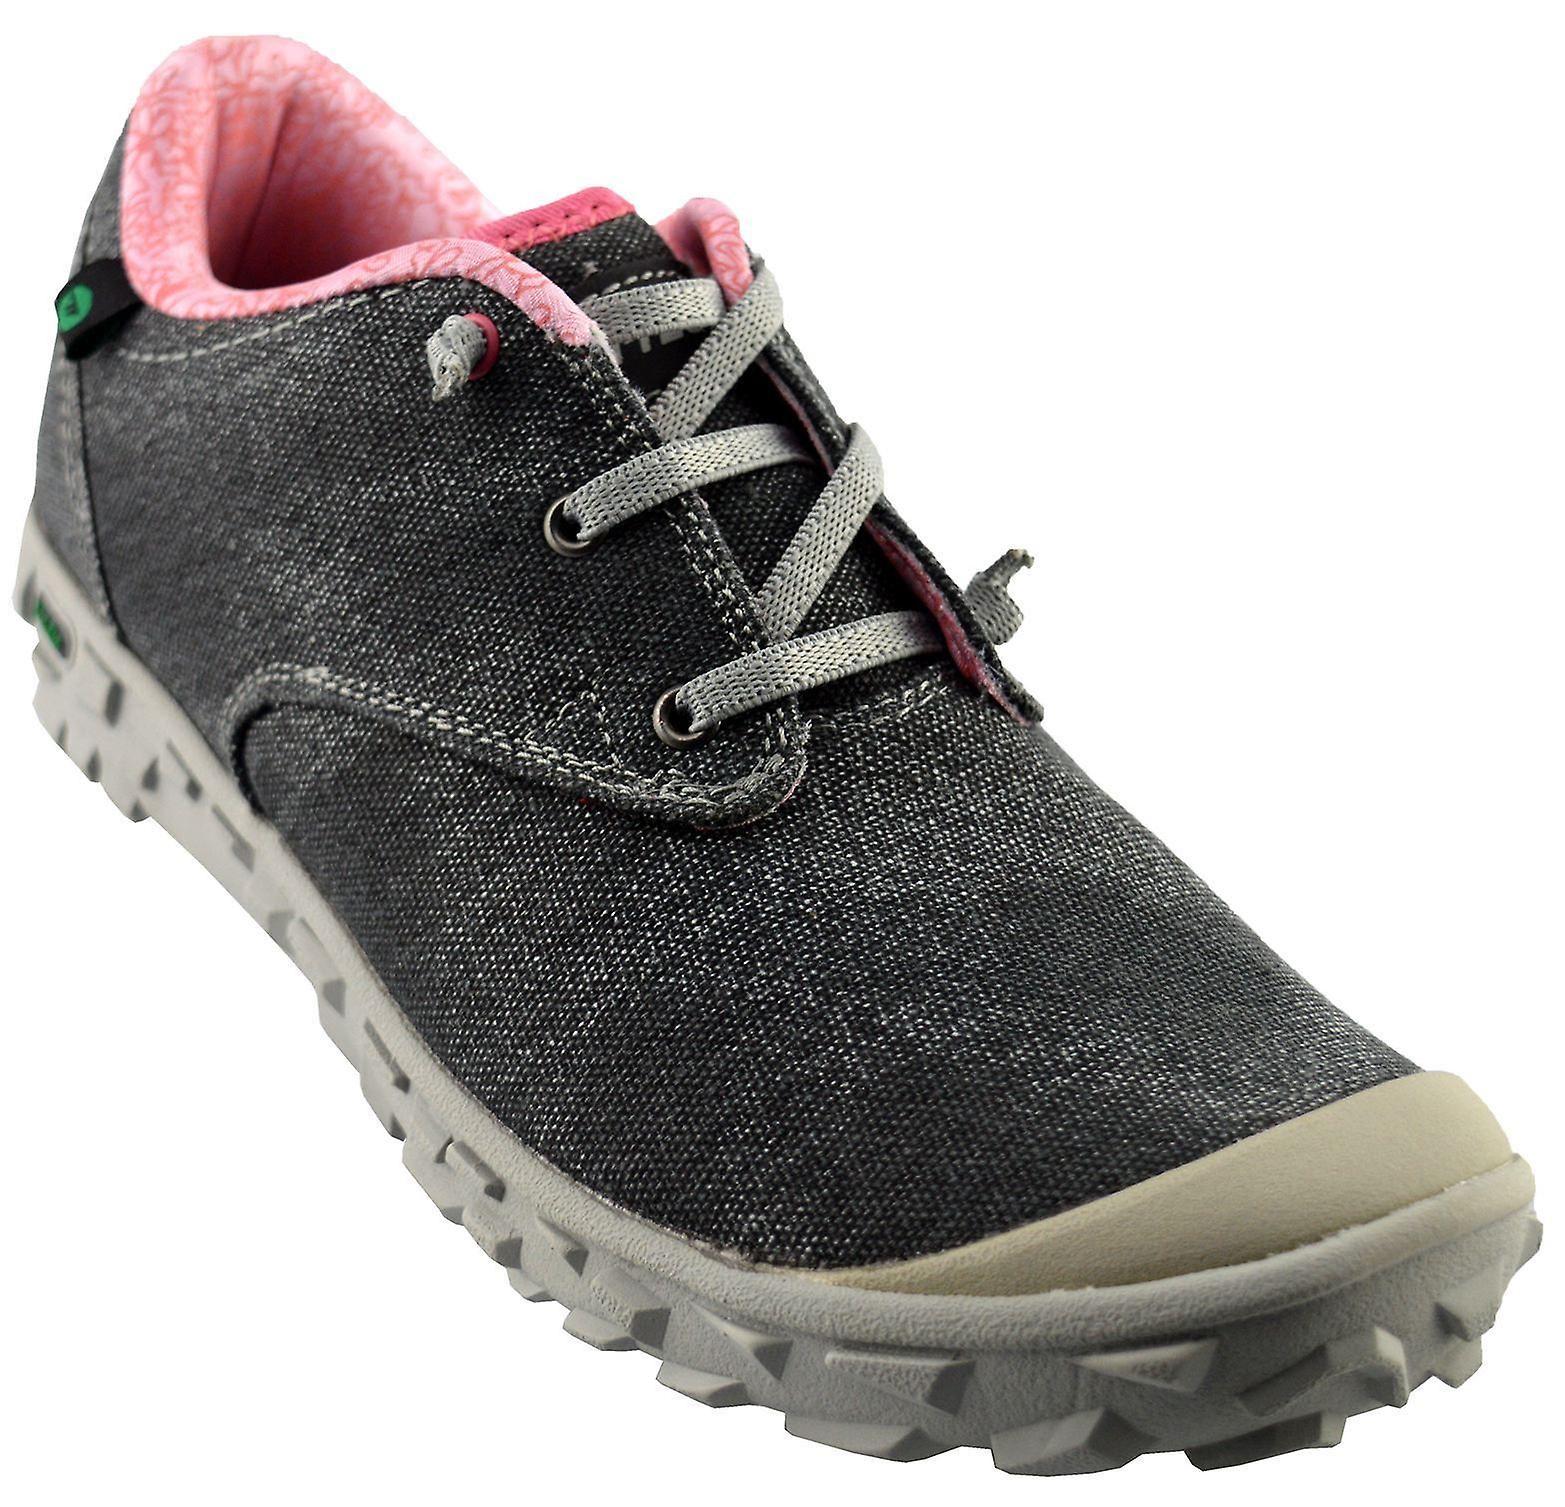 5f5dc62bc2a Ladies Womens New Hi Tec V-Lite Lace Up Hiking Gym Fashion Trainers Shoes